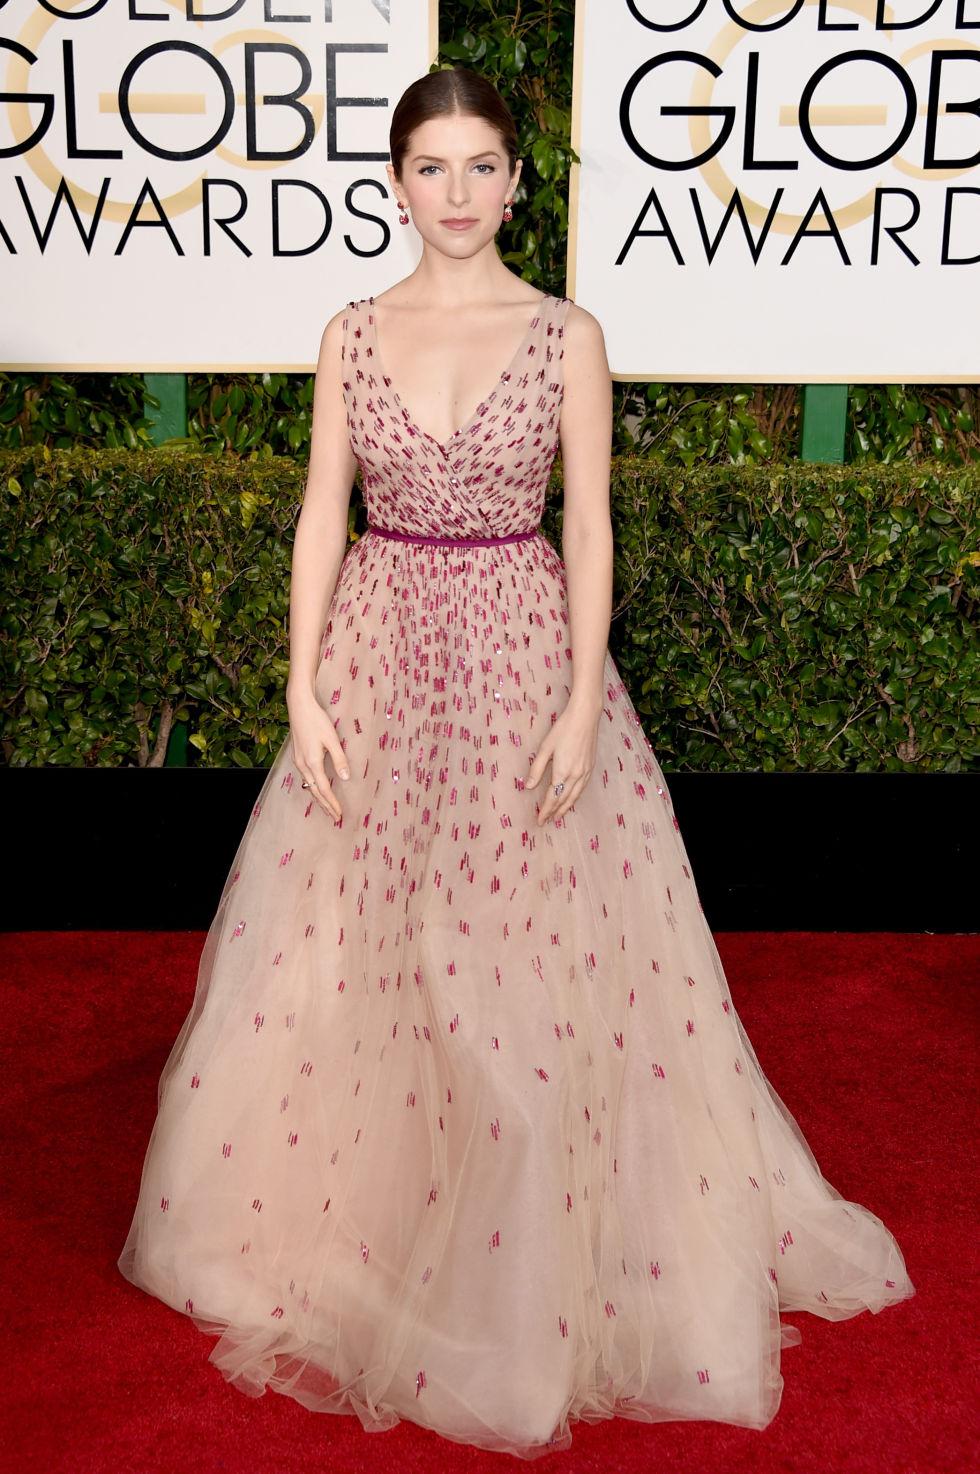 Golden Globes 2015 -TheBest and Worst DressedCelebrities